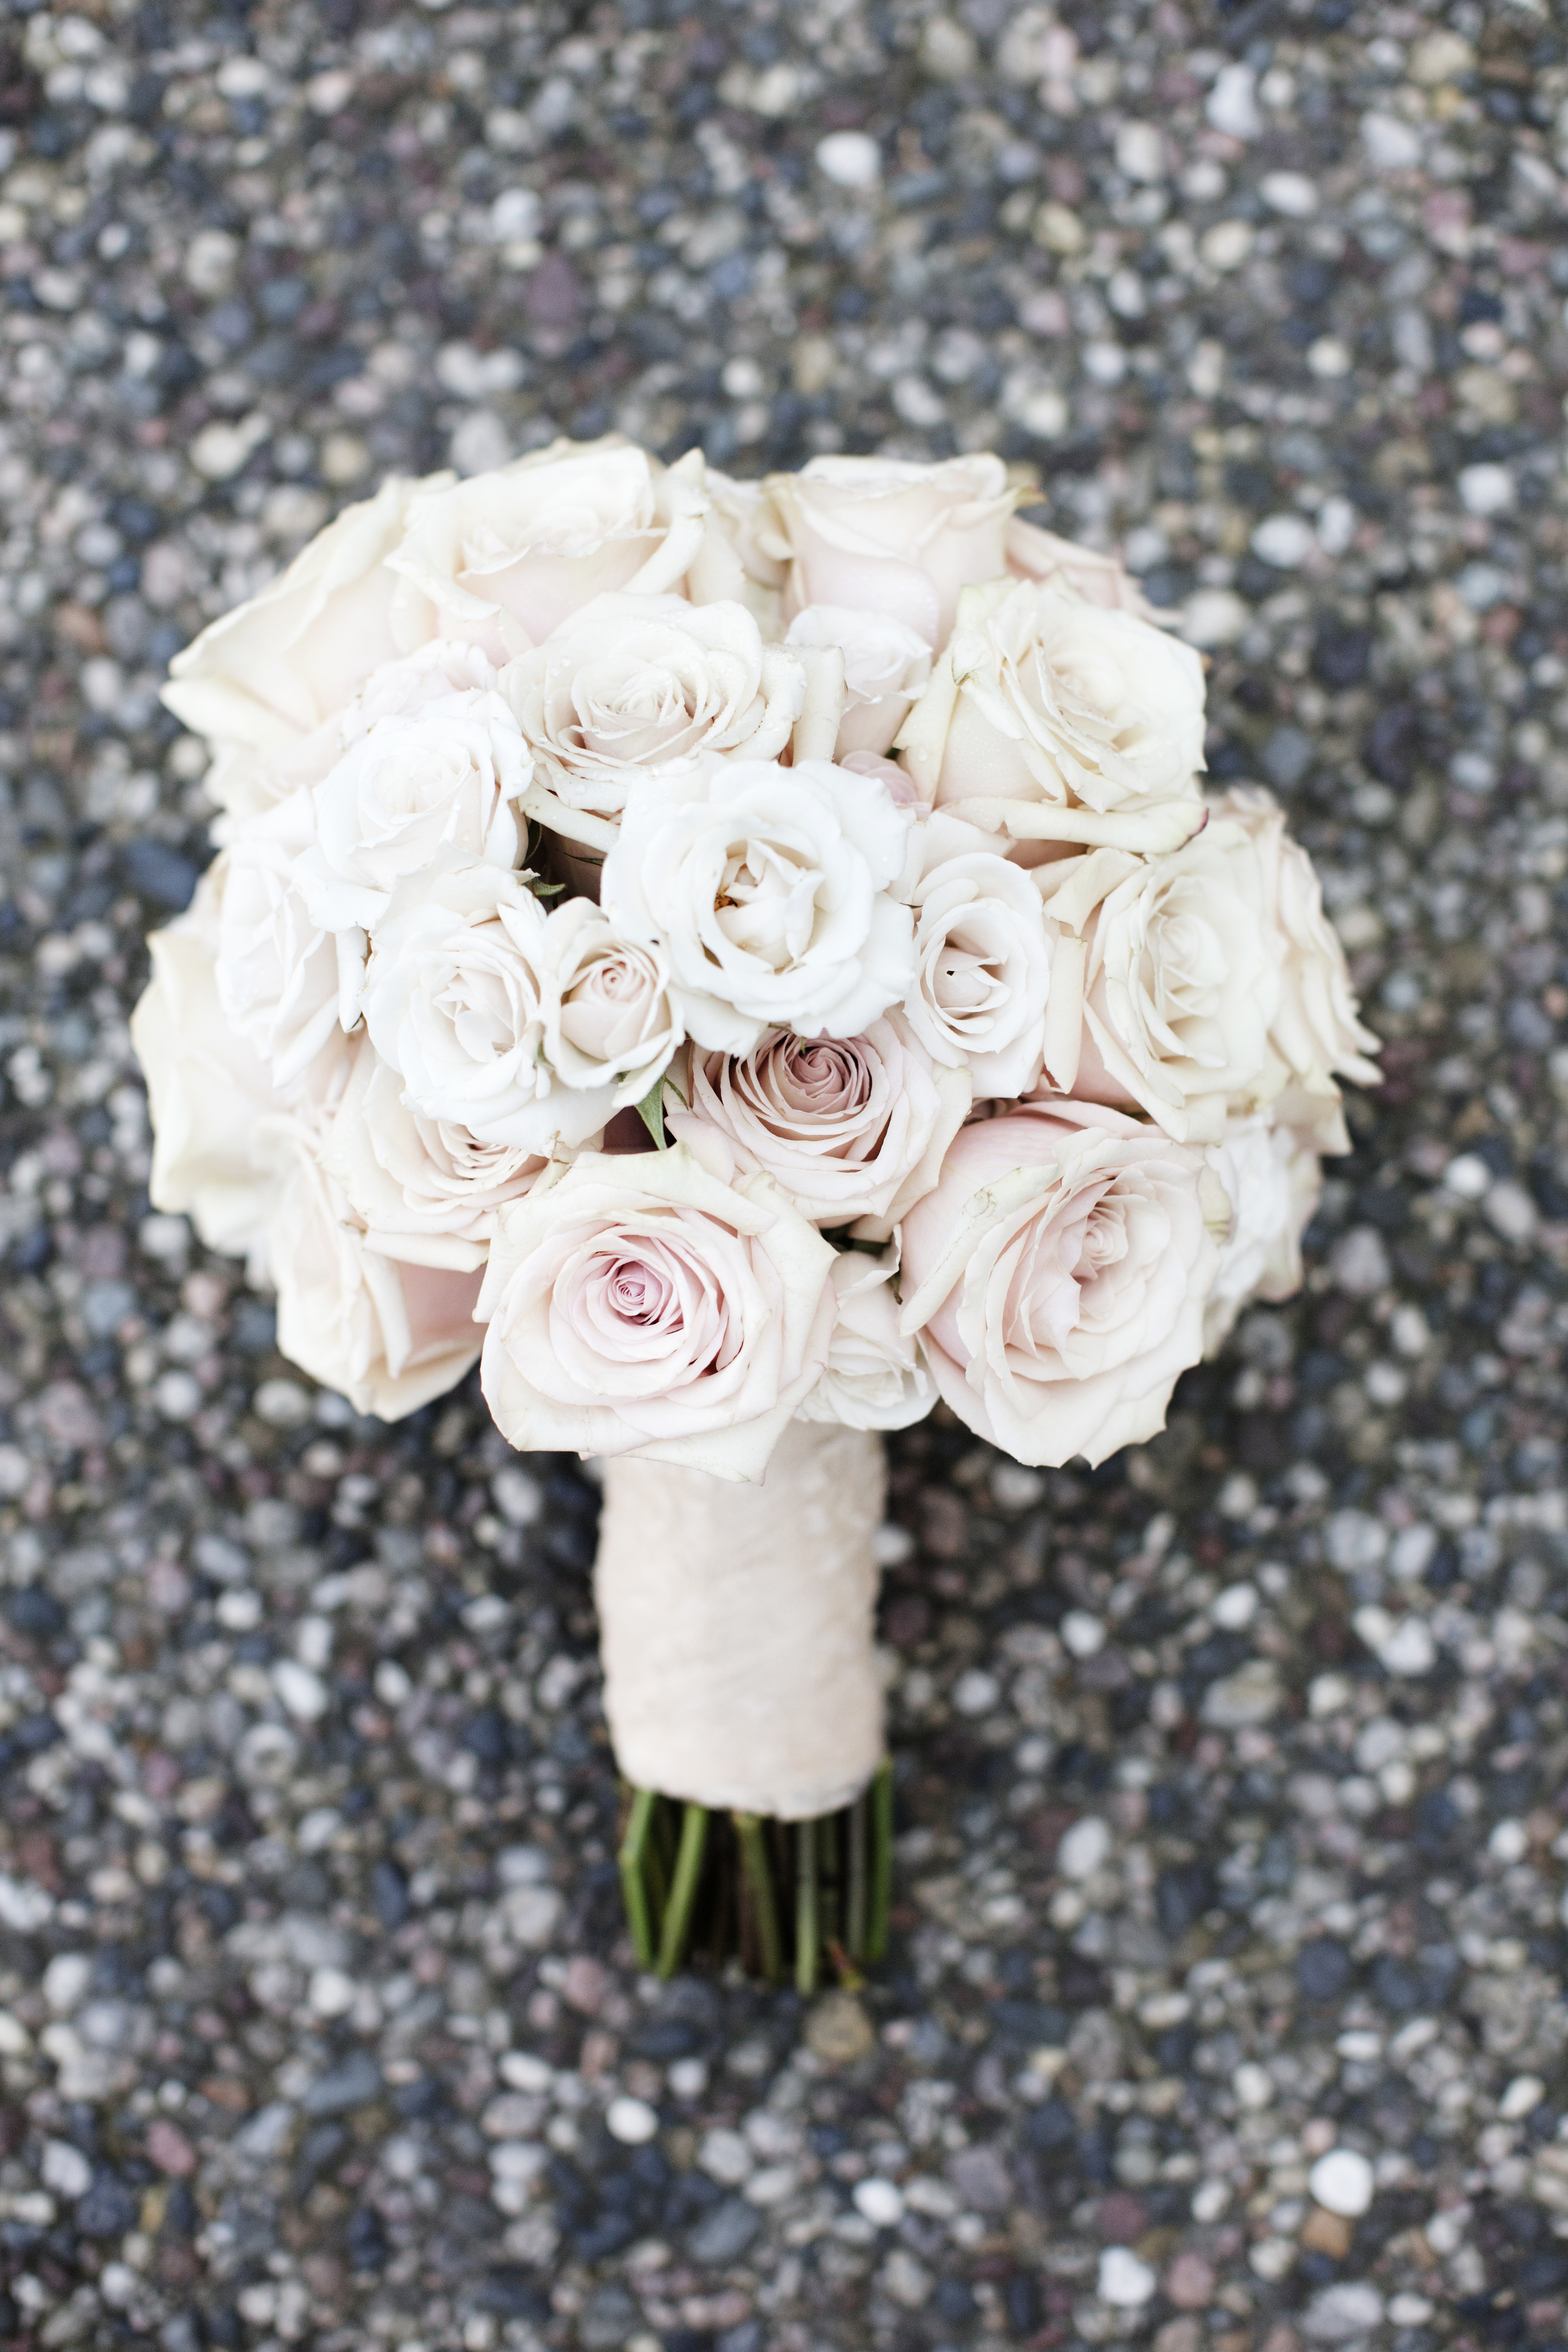 Ceci_New_York_Ceci_Style_Ceci_Johnson_Luxury_Lifestyle_Floral_Lace_Wedding_Letterpress_Inspiration_Design_Custom_Couture_Personalized_Invitations_18.JPG